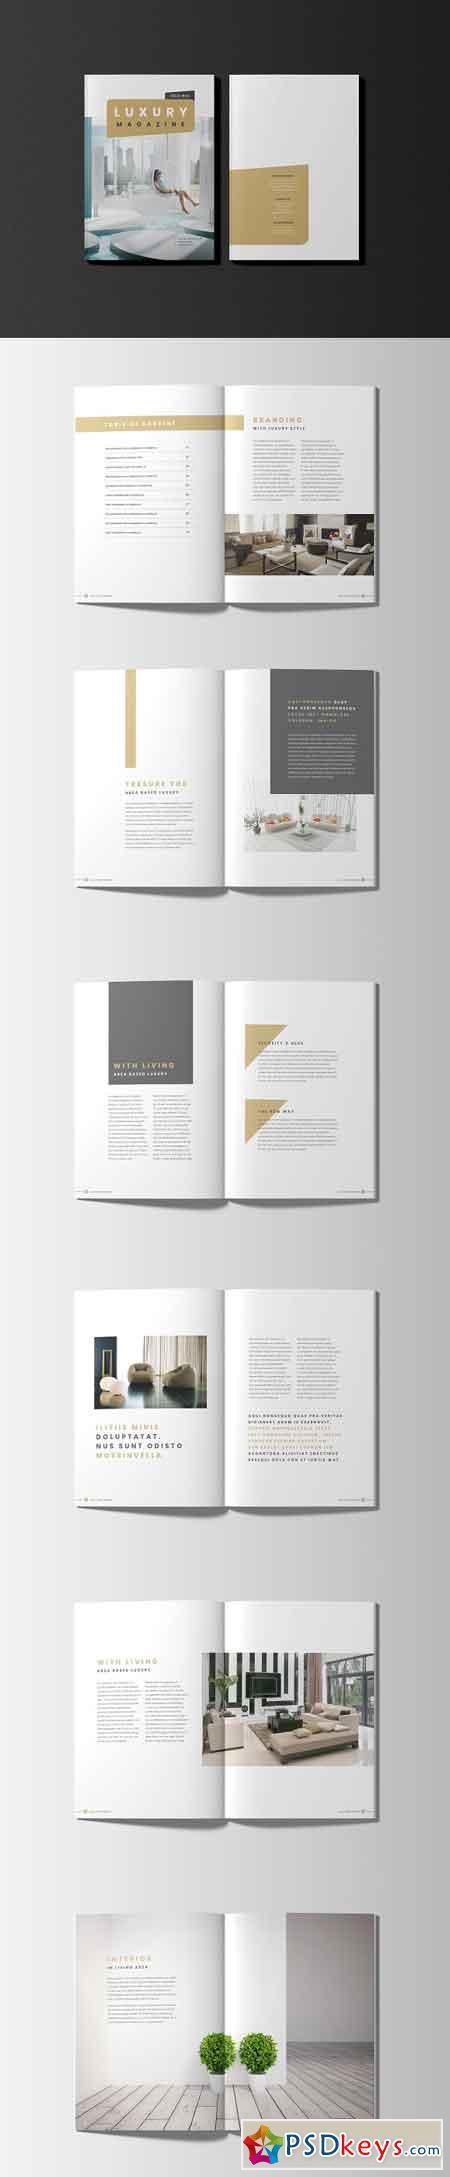 Luxury Lifestyle Magazine LookBook 3197652